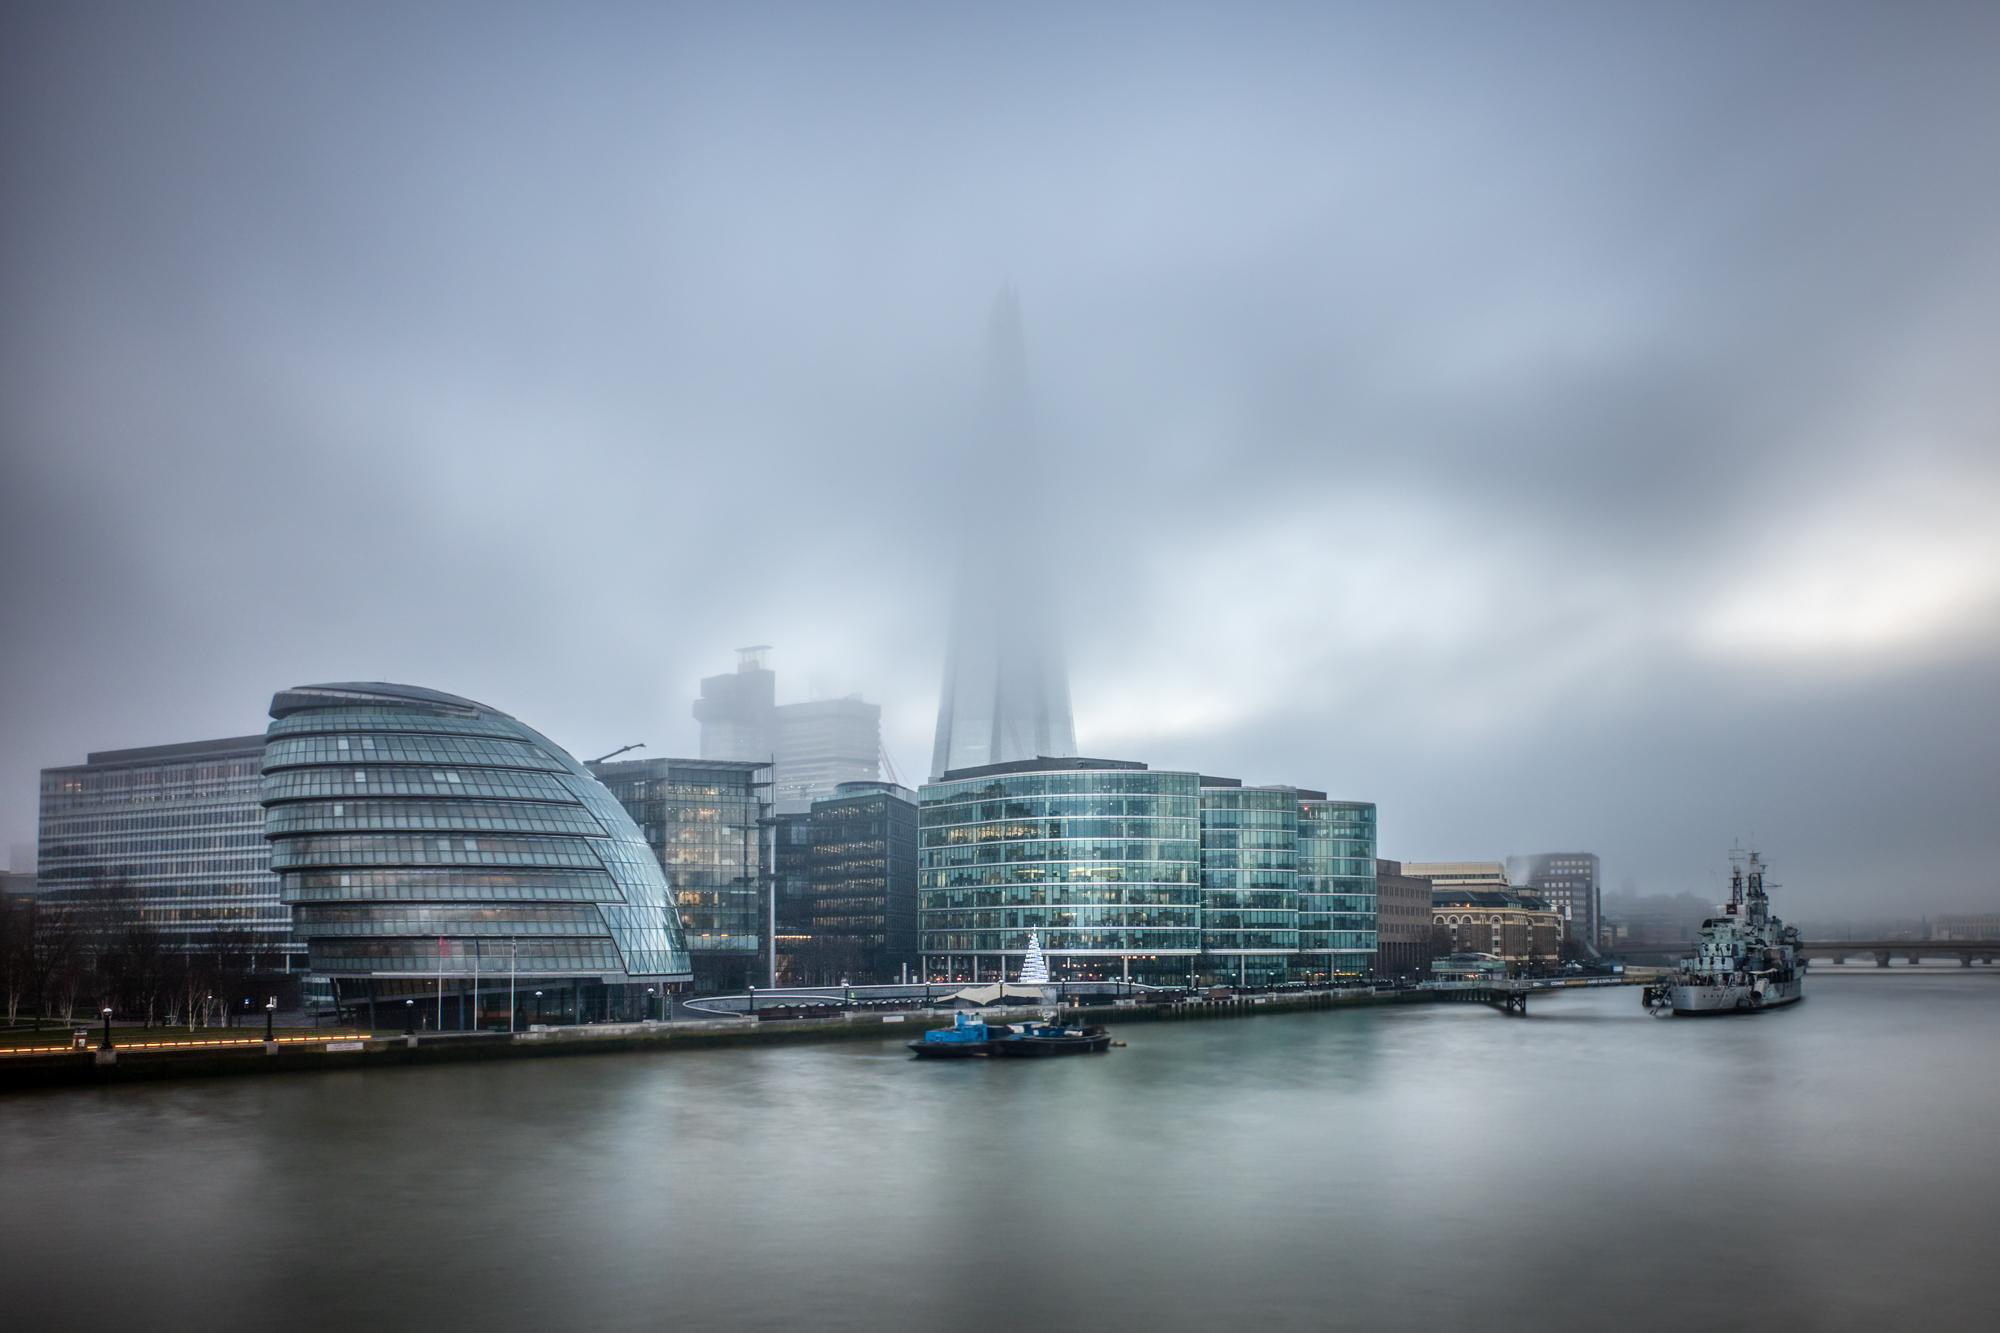 161222 - London - Morning - The Shard 001.jpg